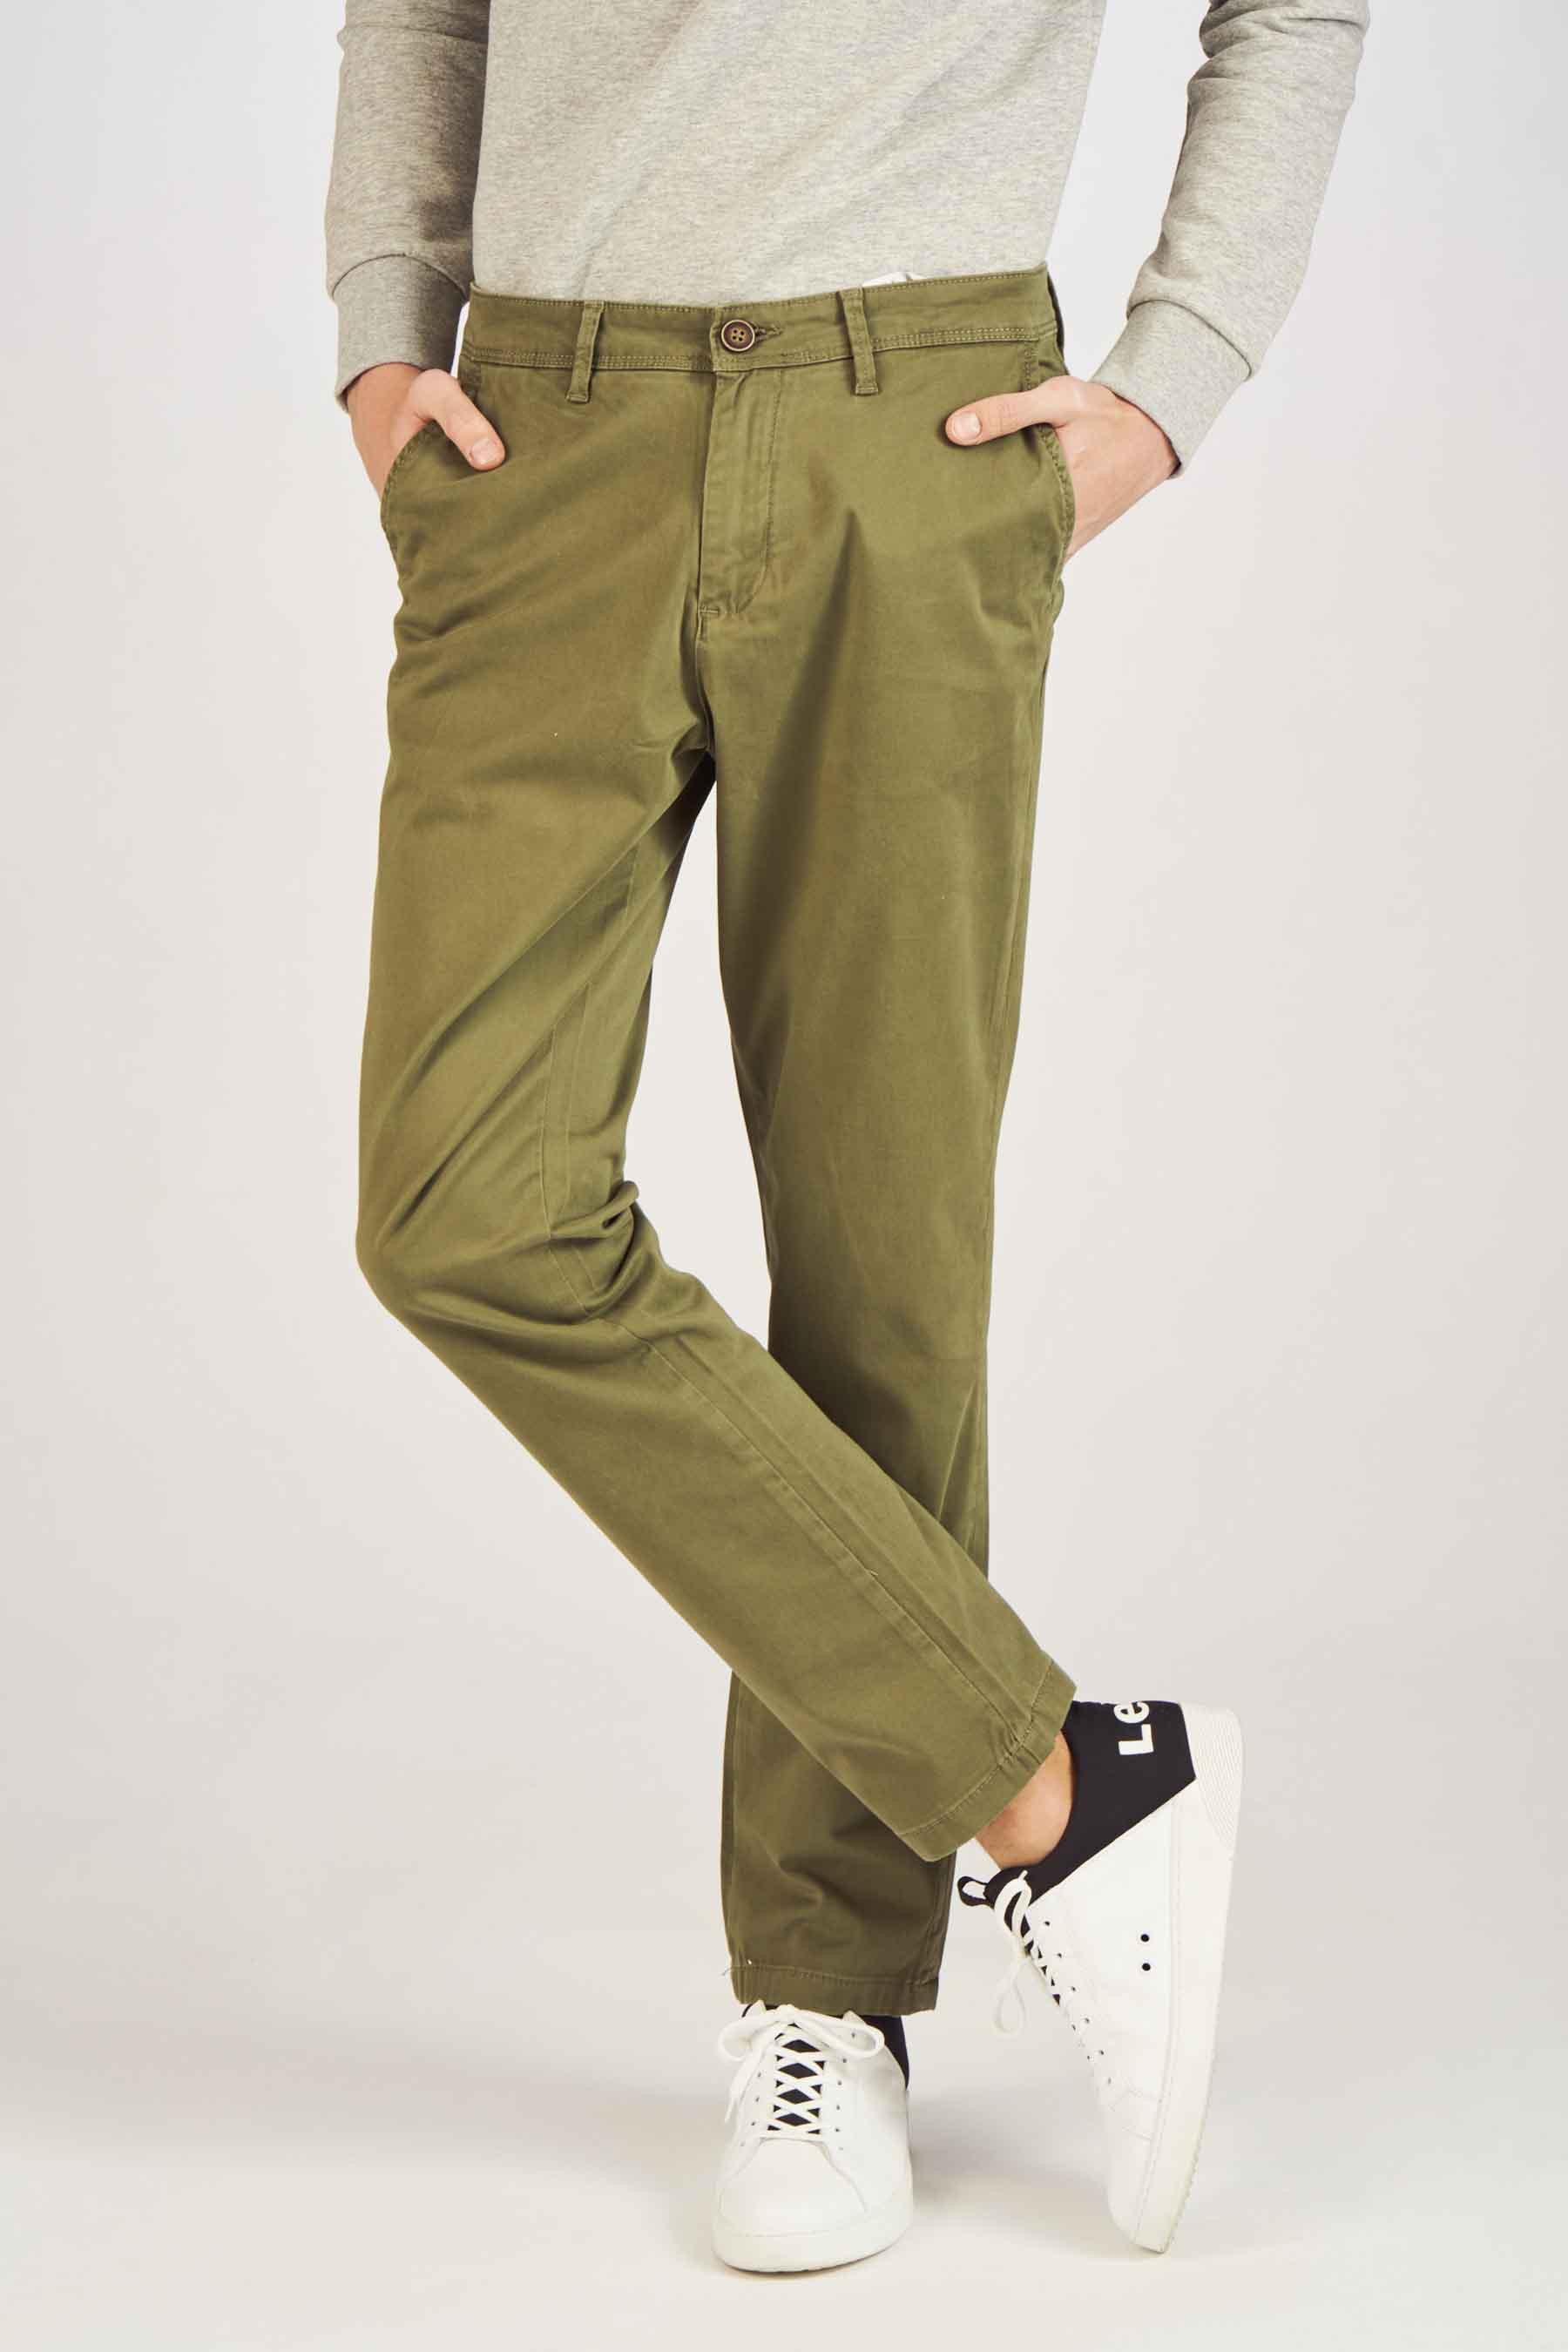 Jack & Jones Jeans Intelligenc Chino, Olive, Heren, Maat: 27x32/28x32/28x34/29x3